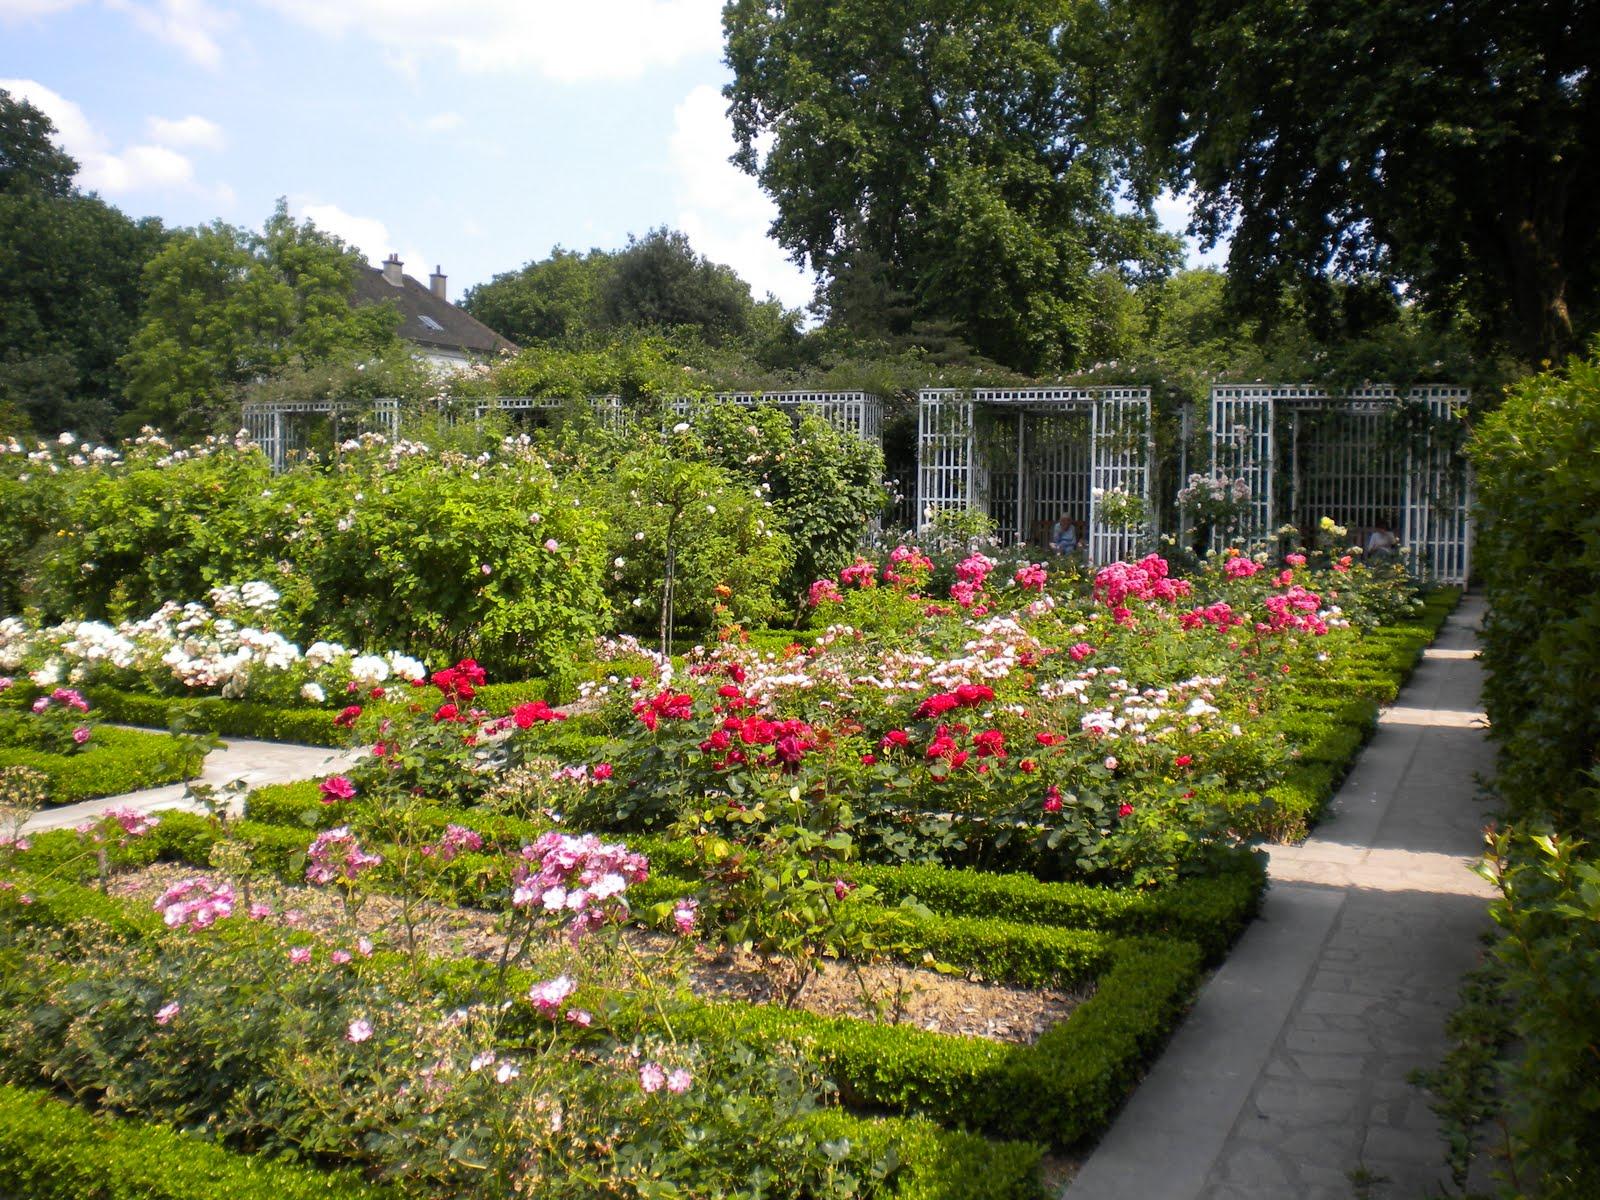 Walk parks gardens unusual places south of paris pub new europe weekend travel for Jardin yitzhak rabin